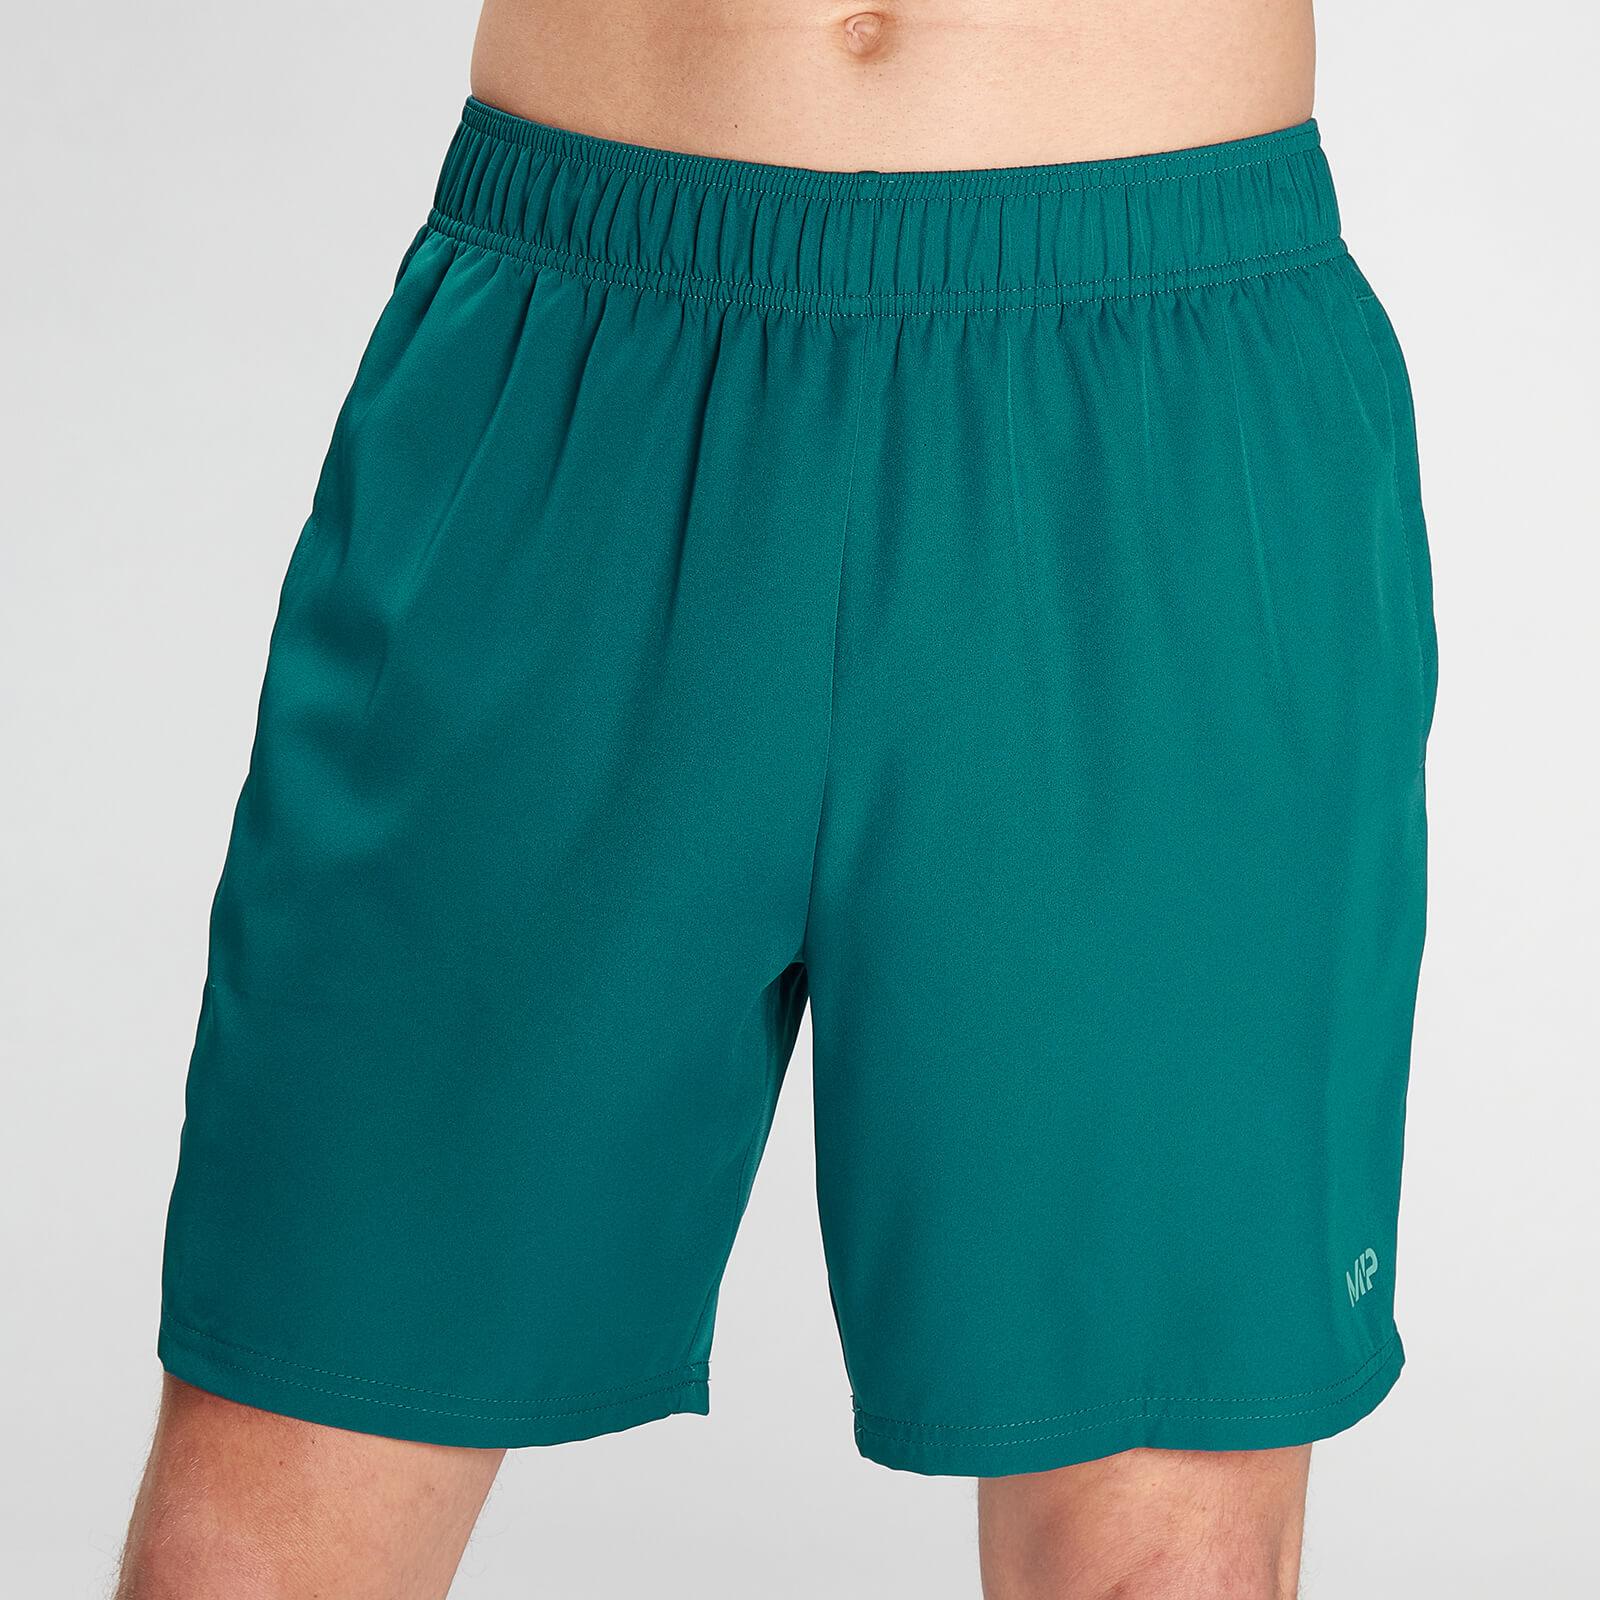 Купить MP Men's Limited Edition Impact Shorts - Teal - XXL, Myprotein International